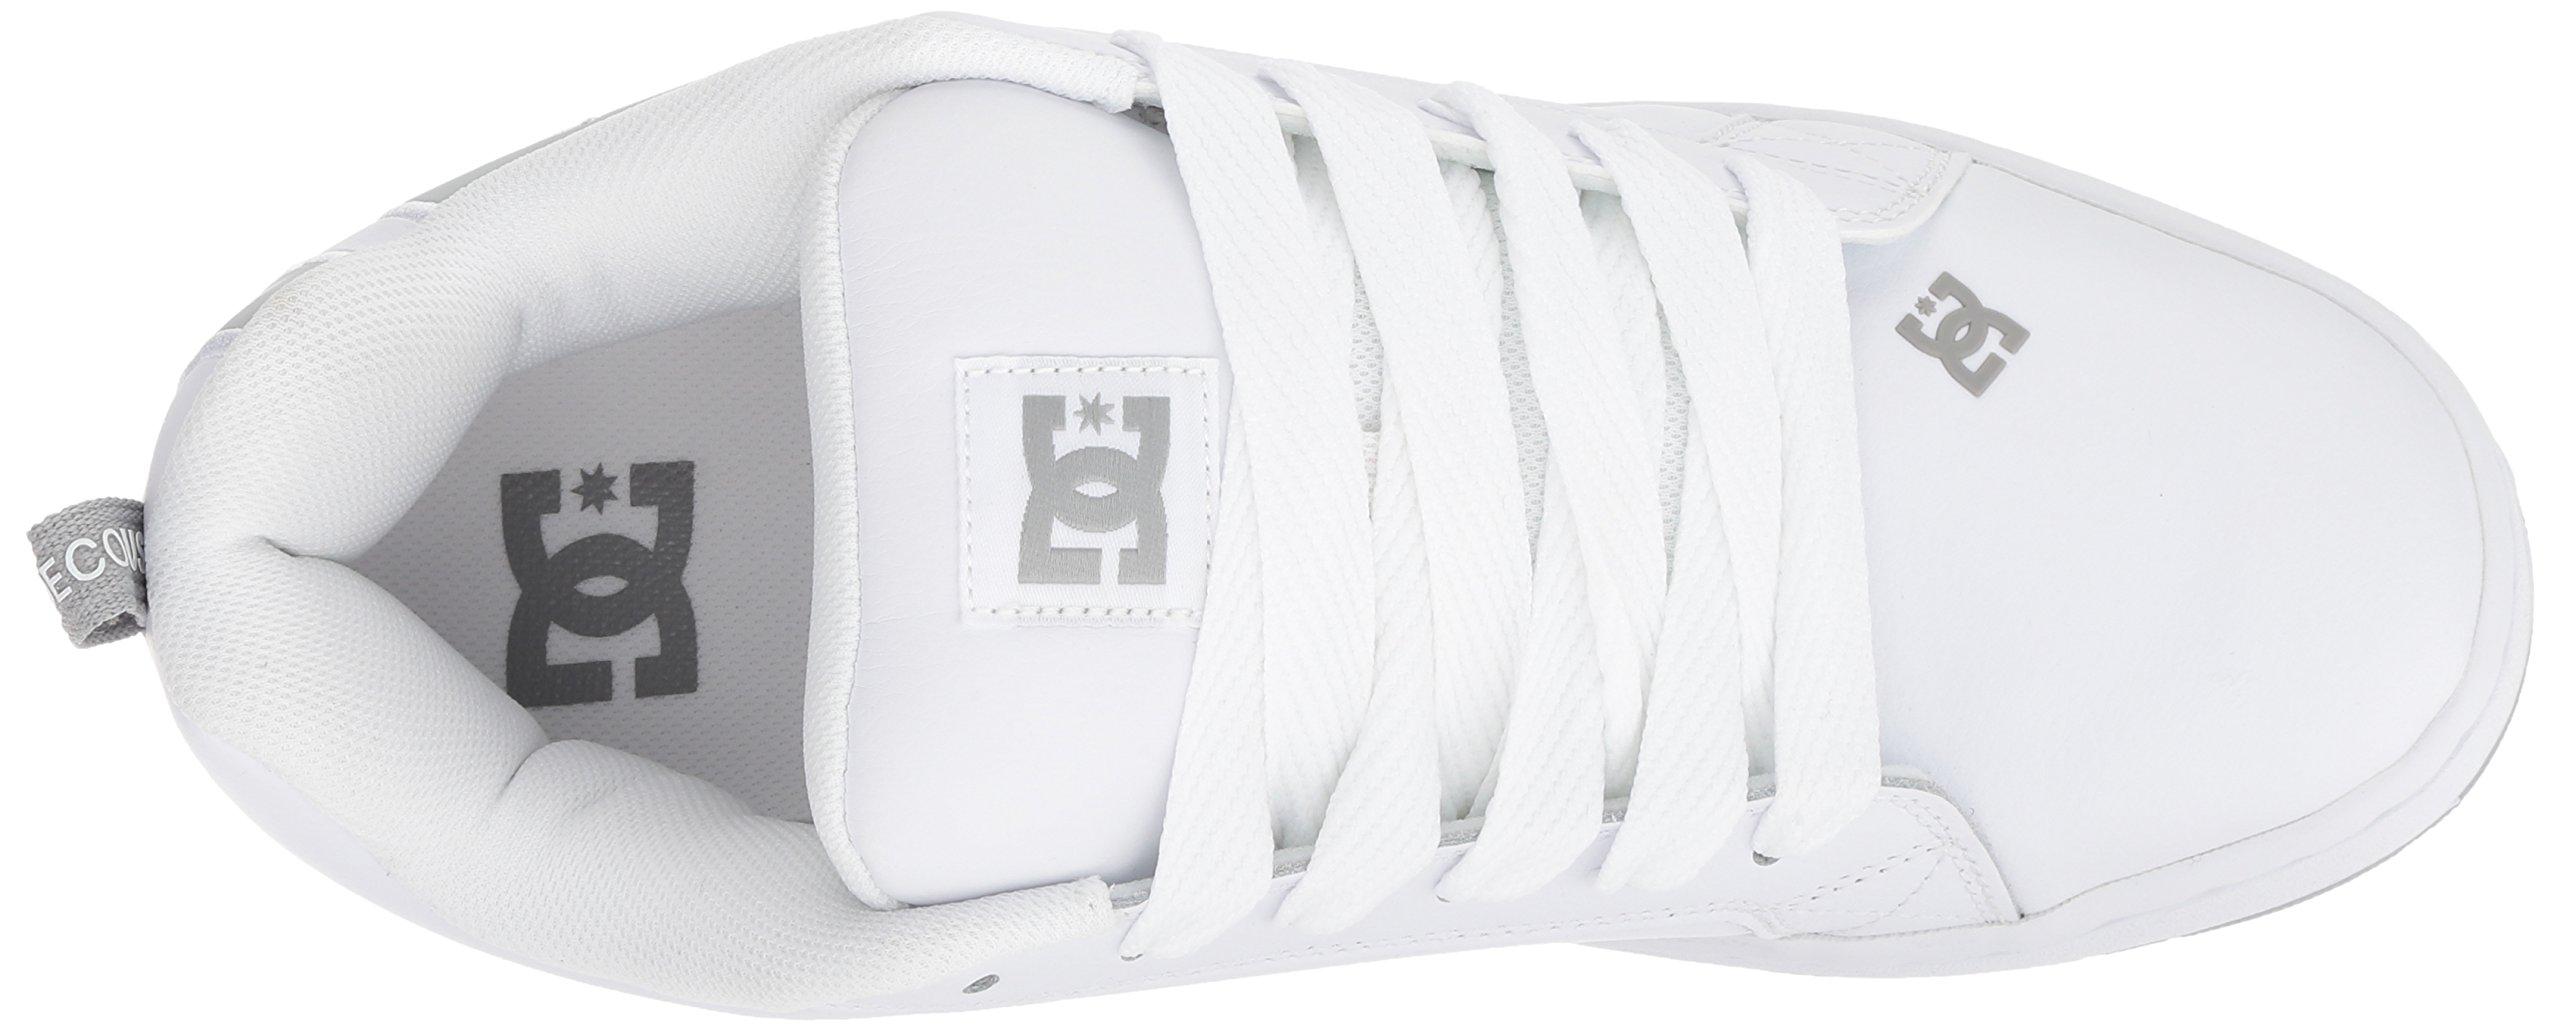 DC Men's Court Graffik SE Skate Shoe White Grey, 15 Medium US by DC (Image #7)